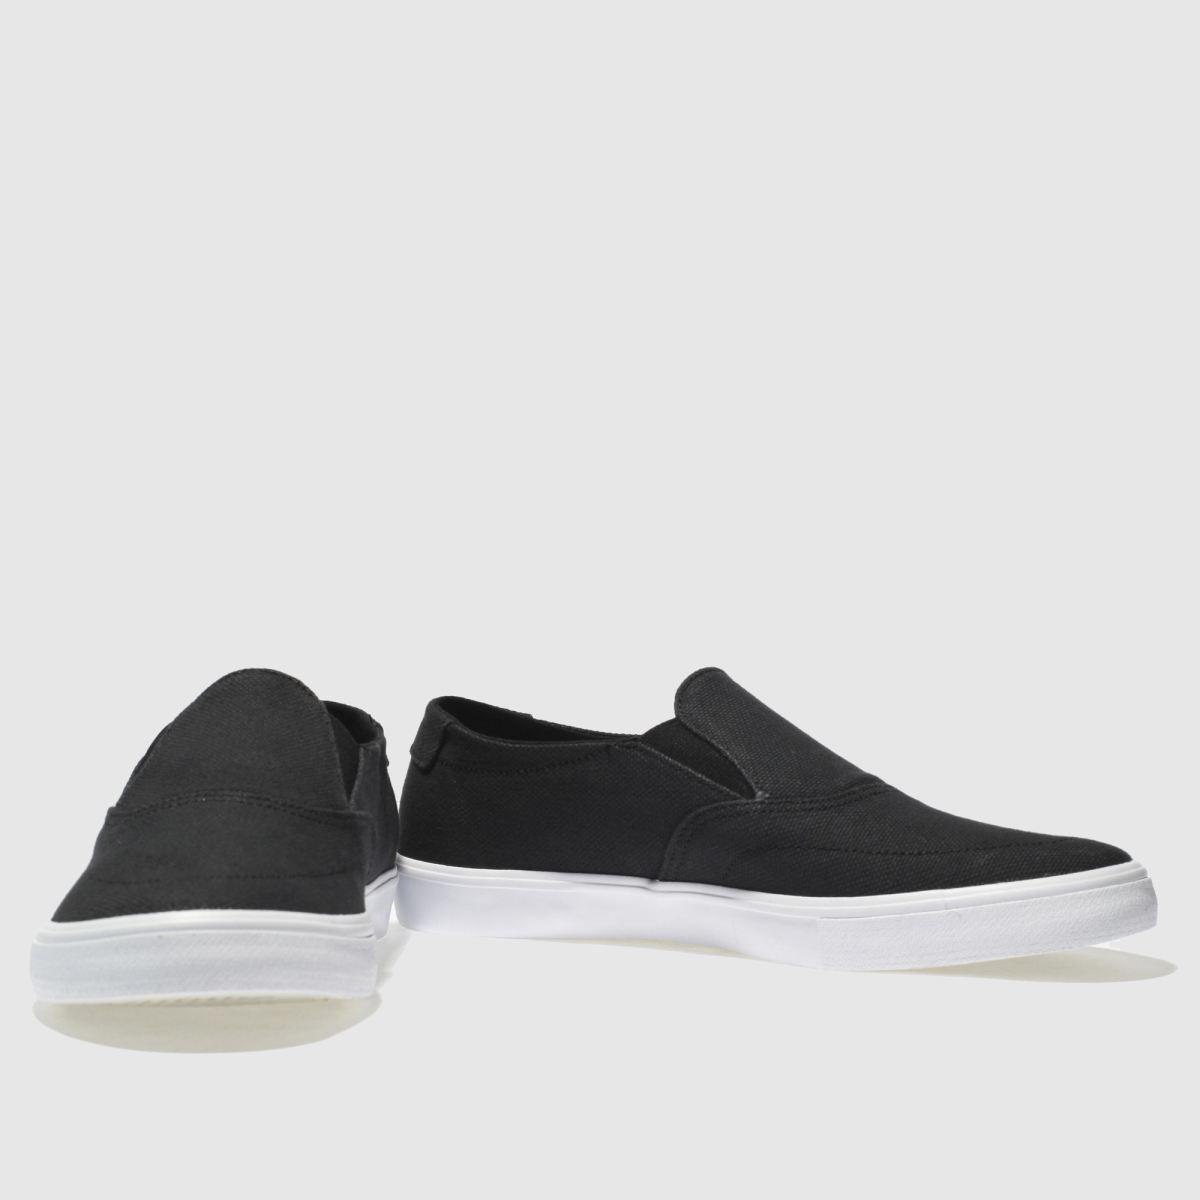 Herren Schwarz nike sb Portmore Ii Slip Sneaker   schuh Gute Qualität beliebte Schuhe